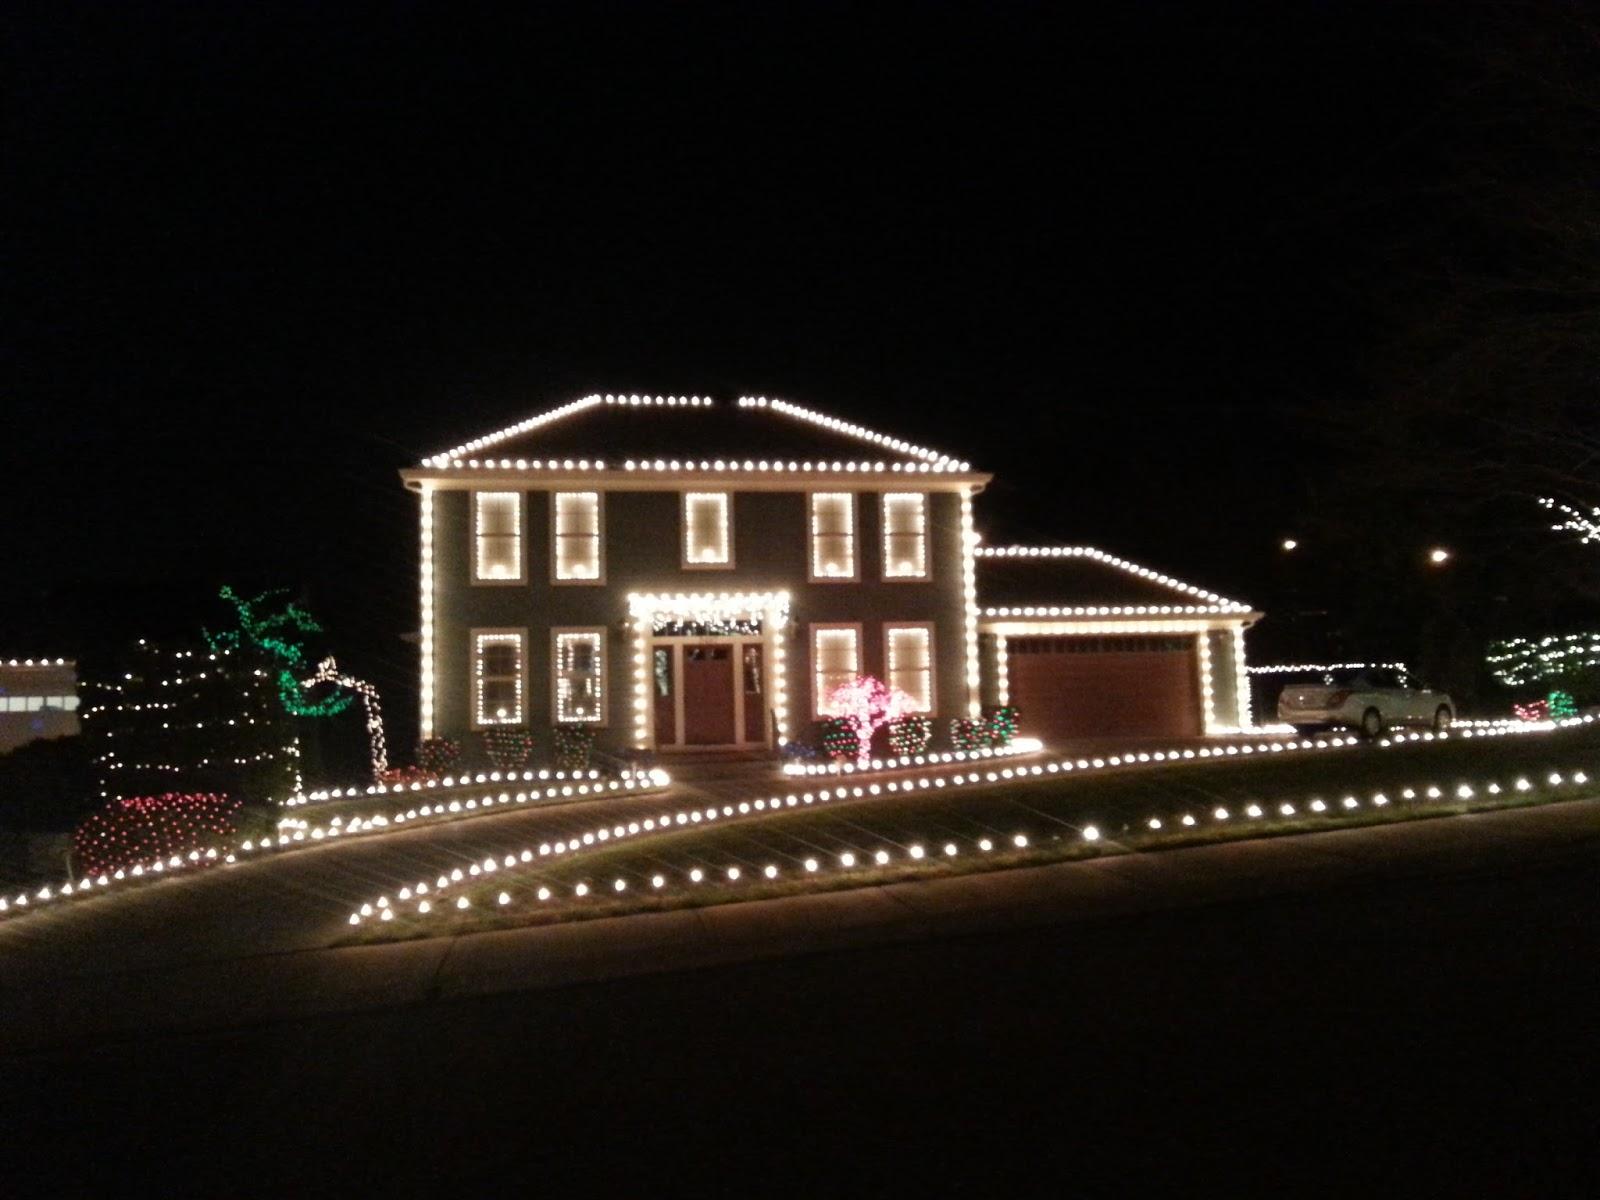 CHRISTMAS LIGHTS TRAIL THROUGH THE